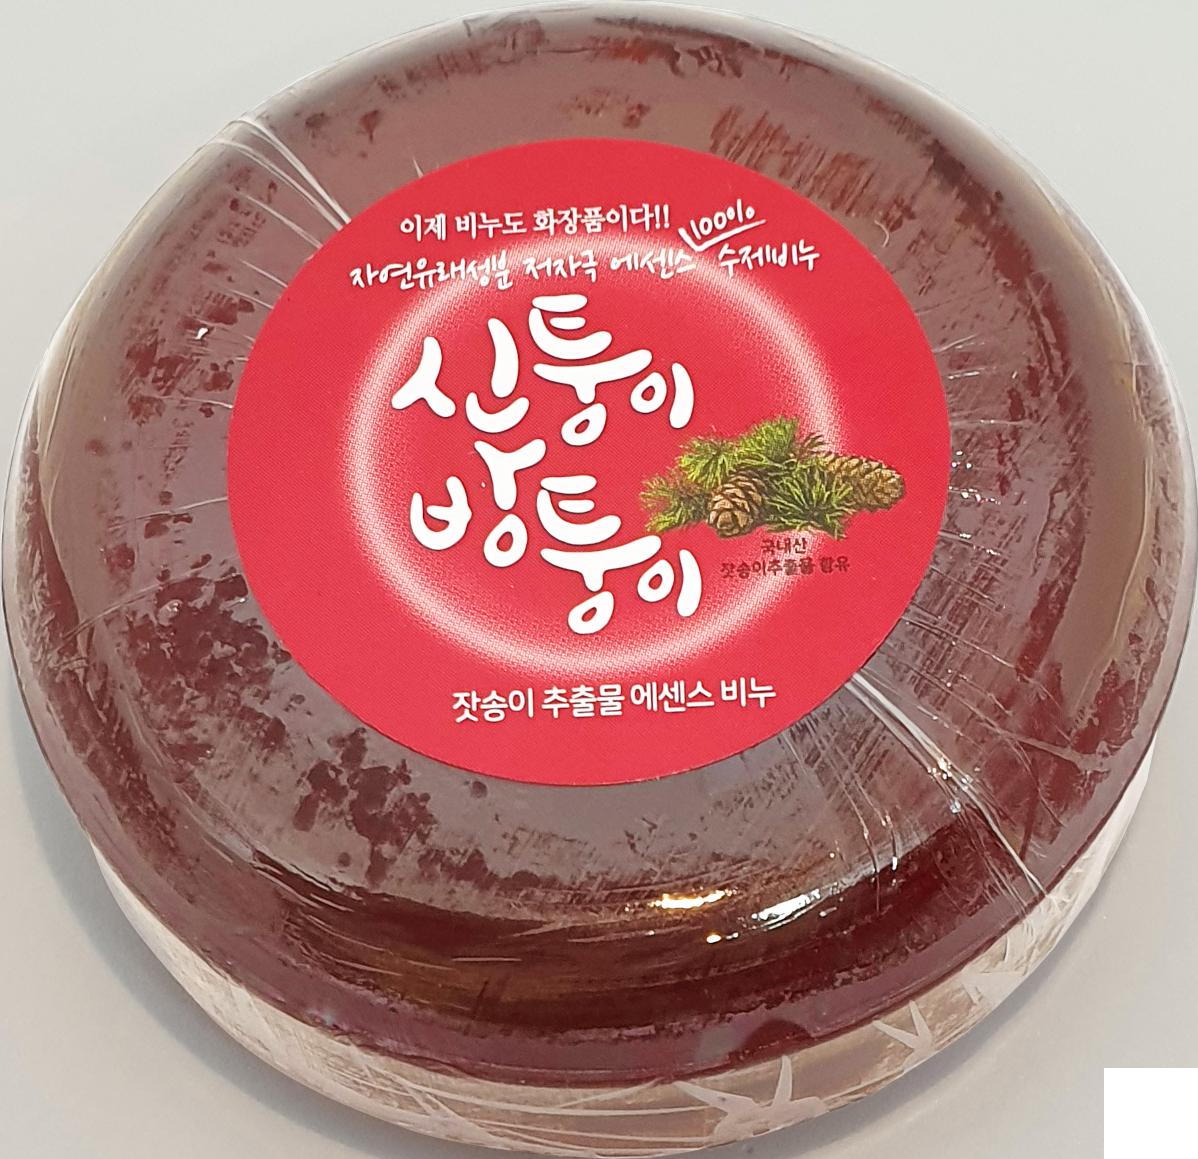 Korea Handmade Soap